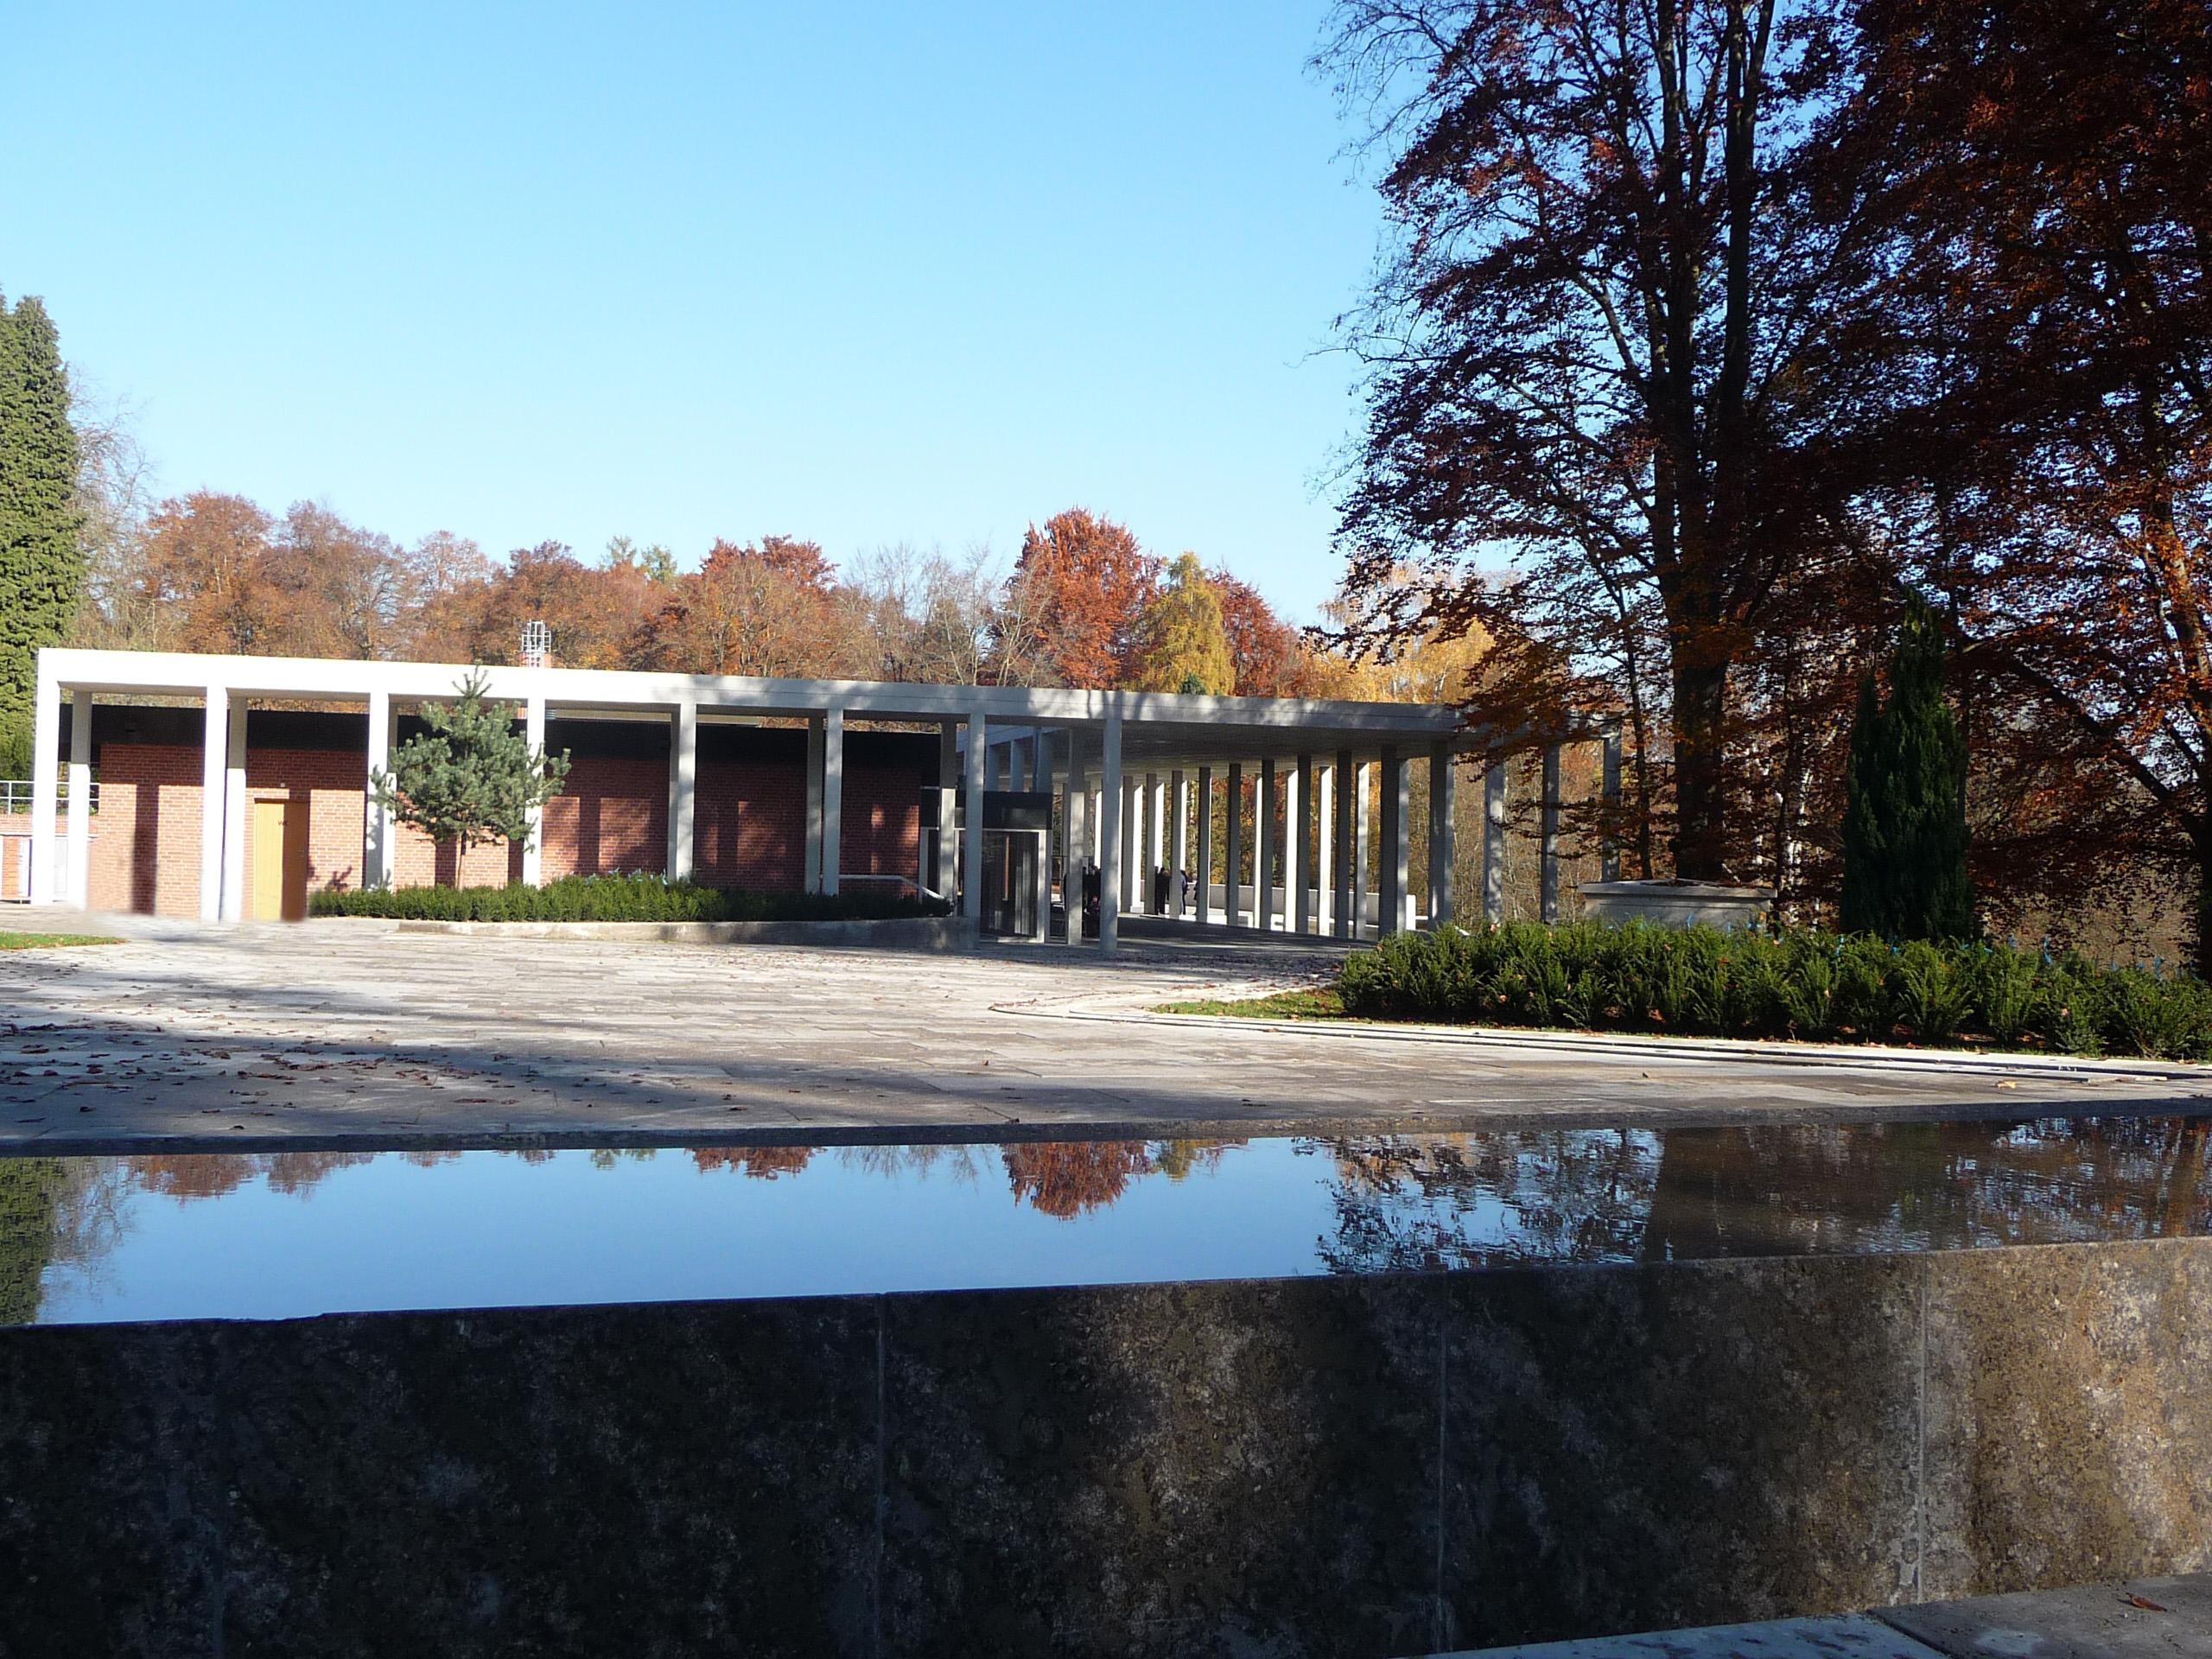 Hauptfriedhof Ulm